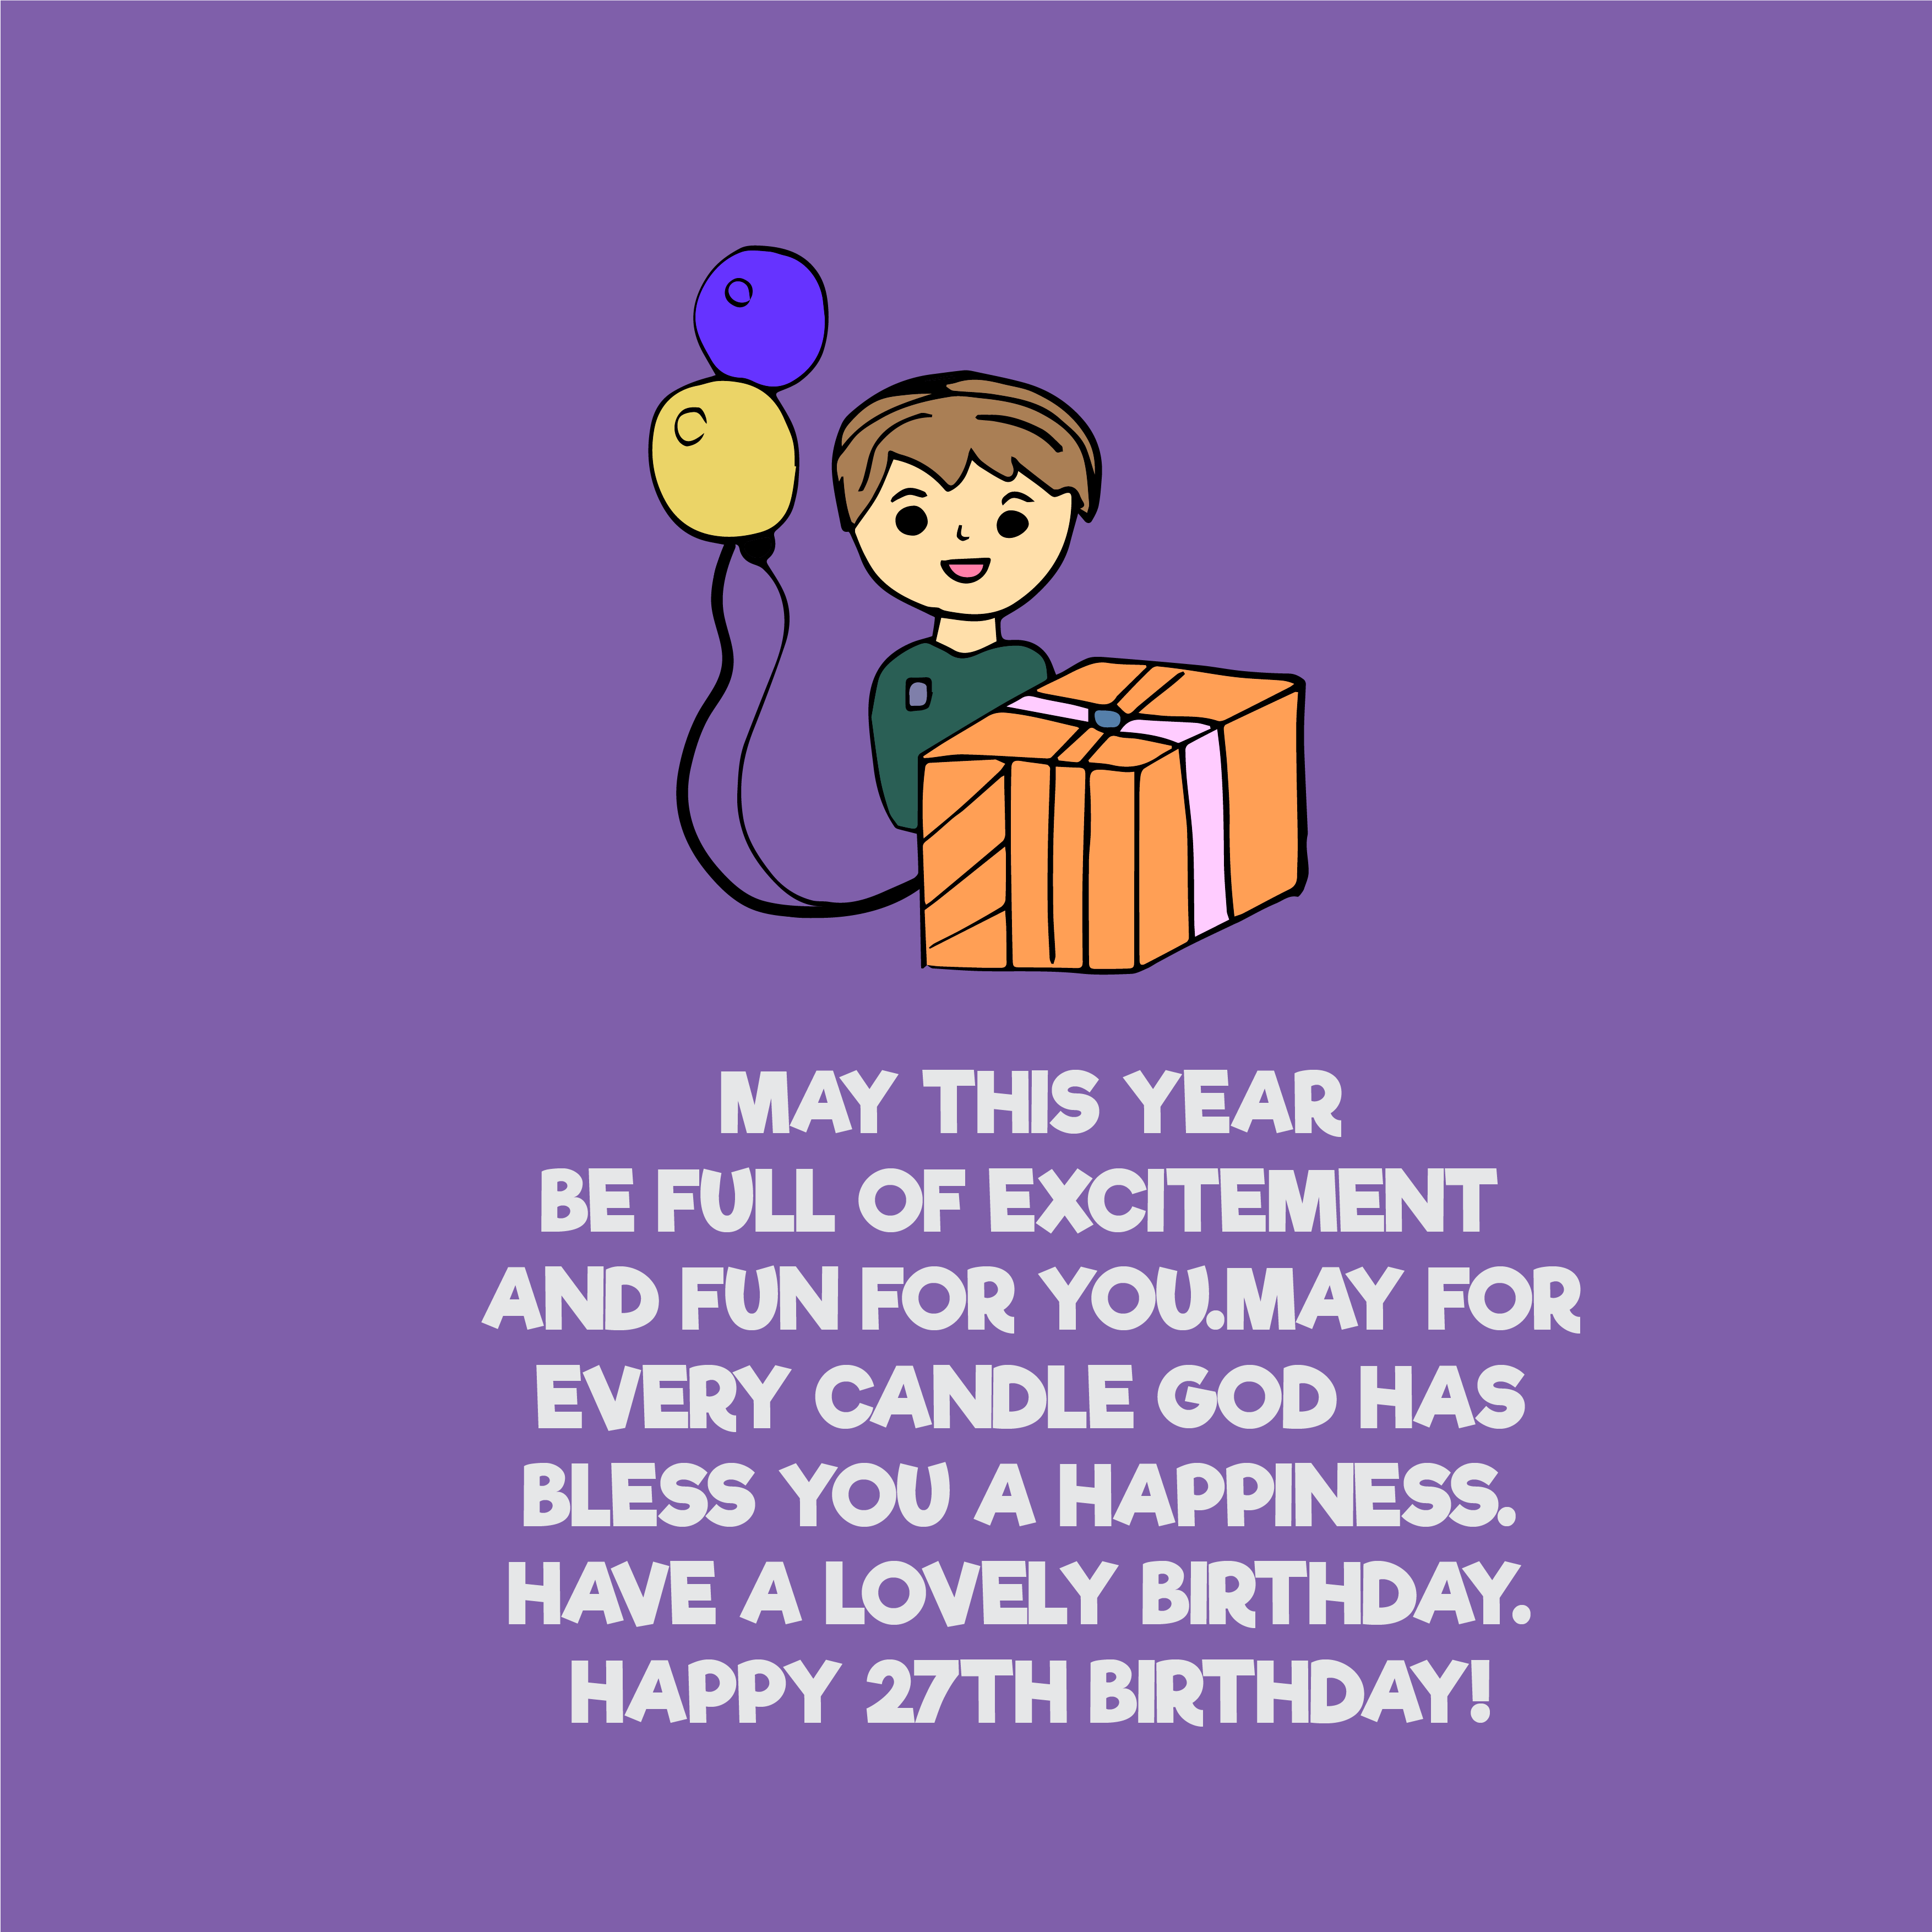 happy-27th-birthday-wishes-06